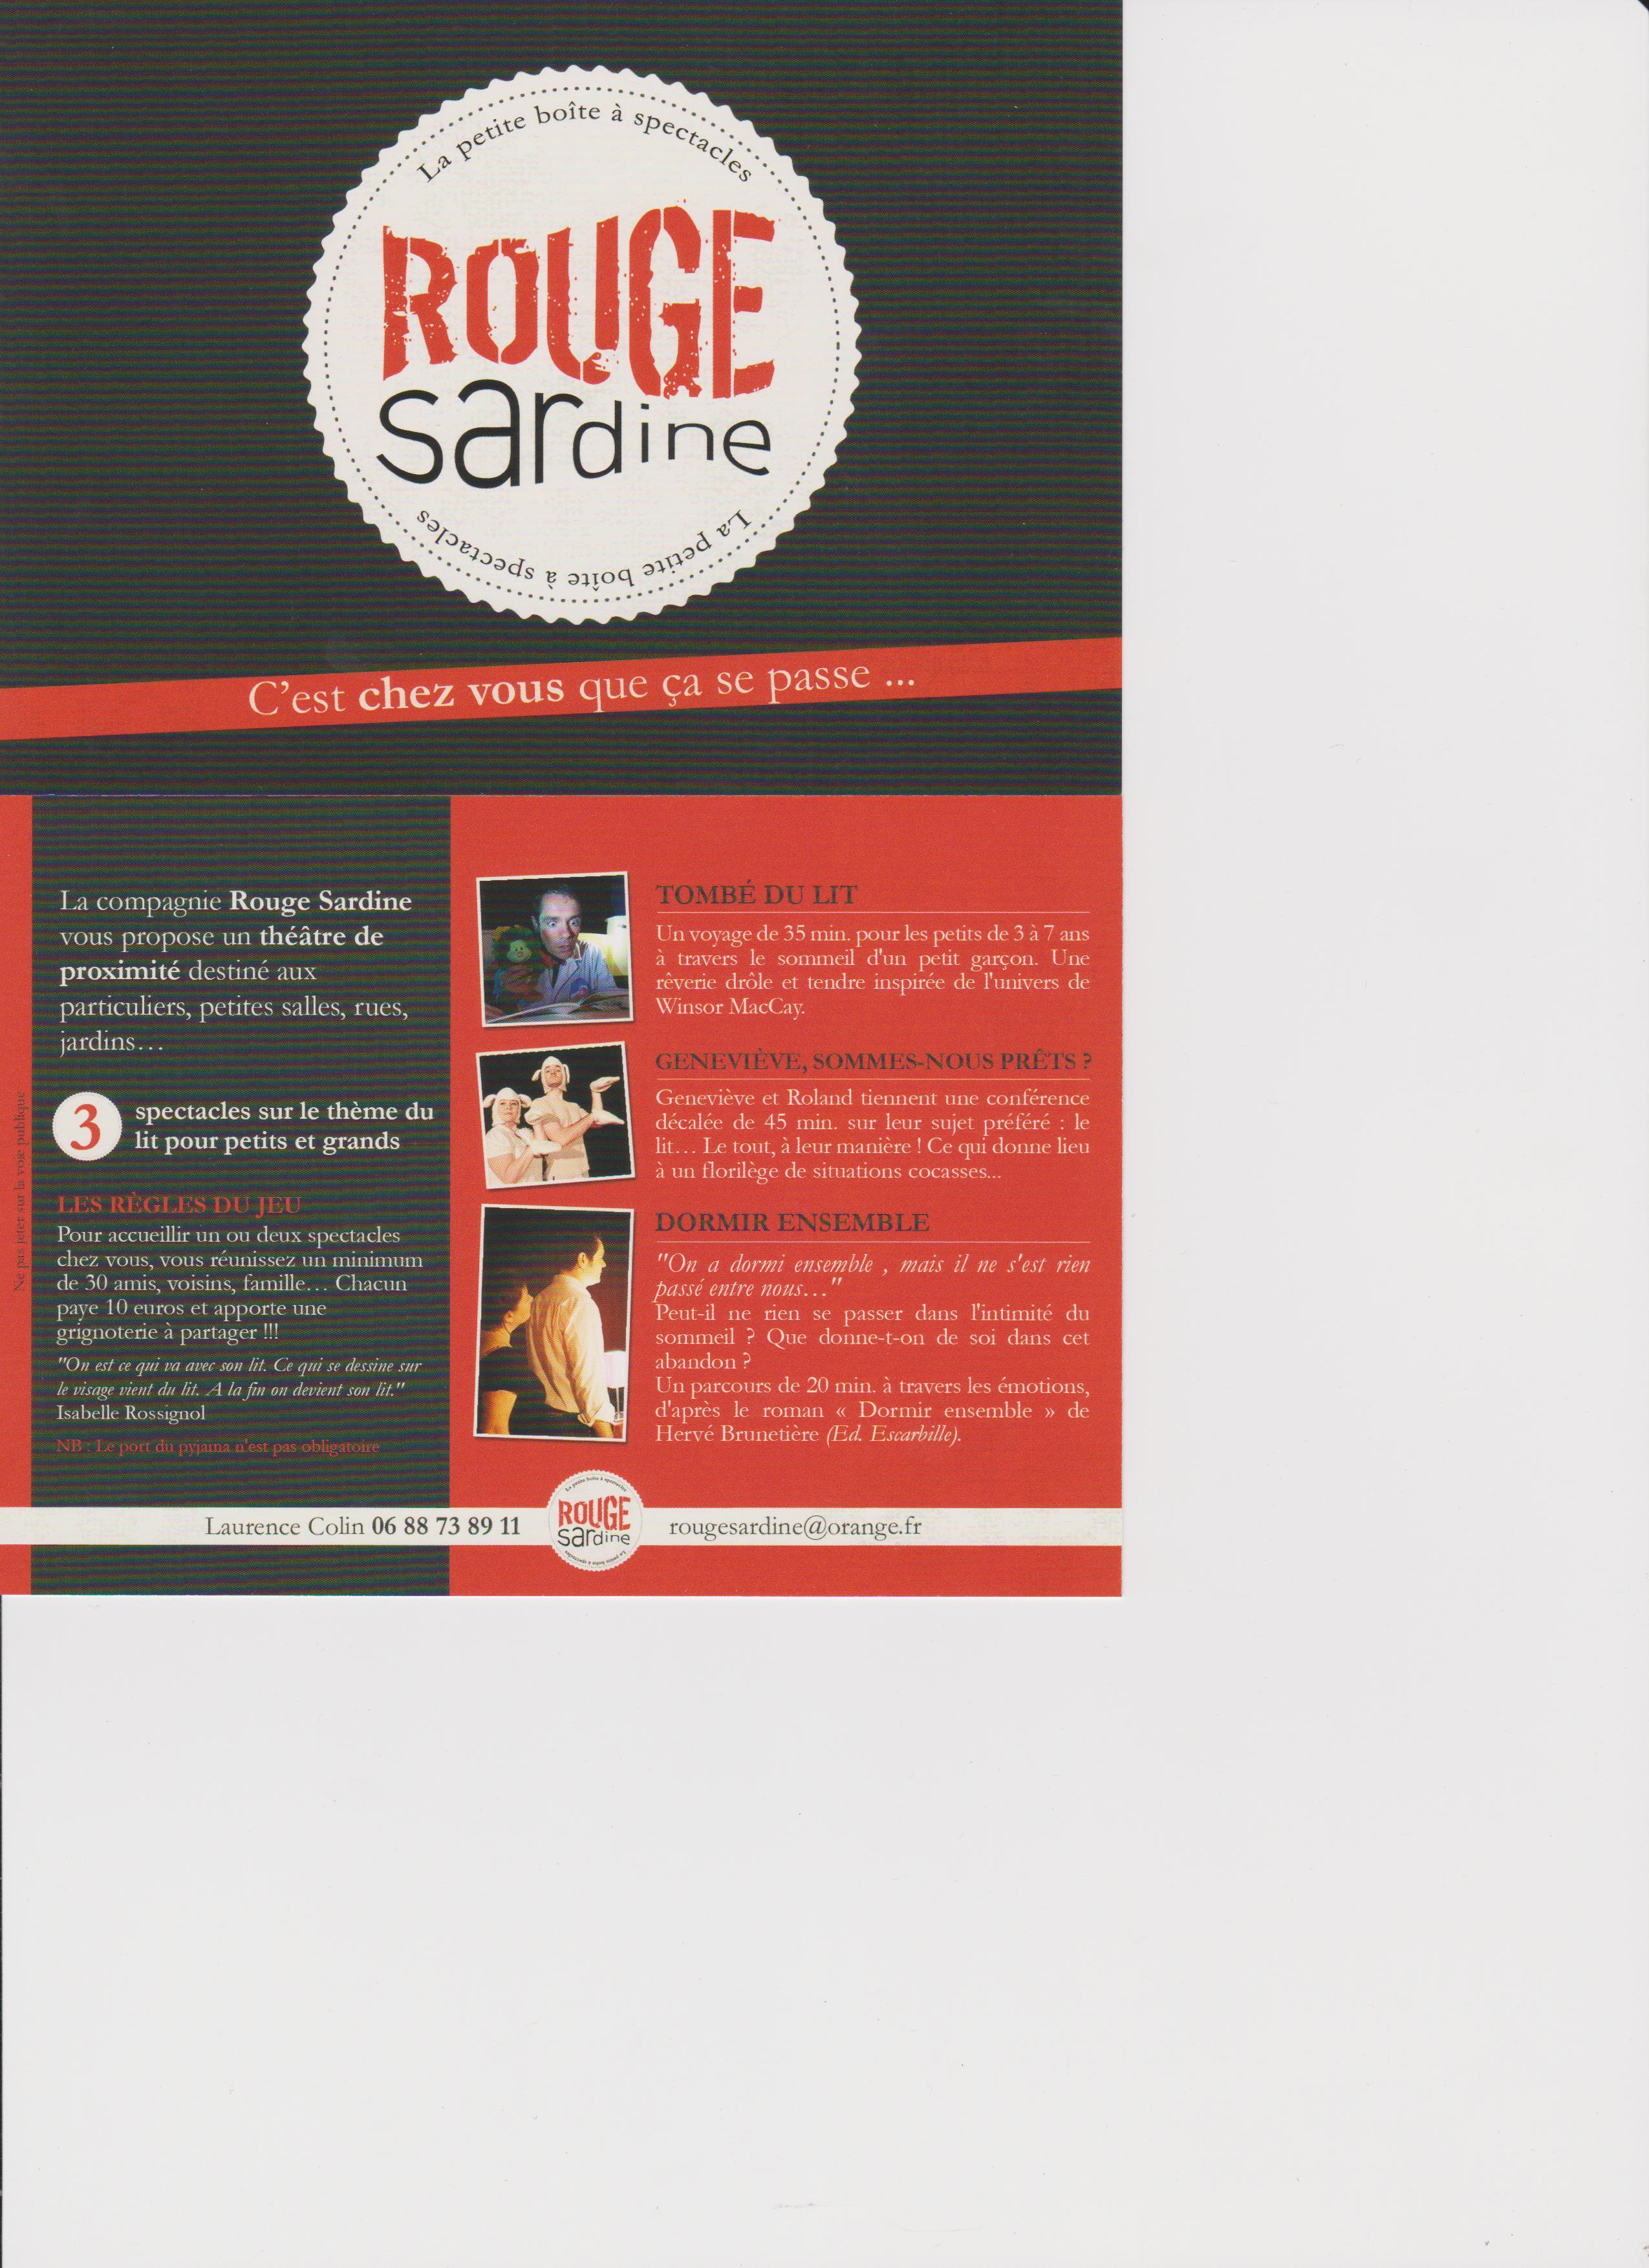 ROUGE SARDINE 001